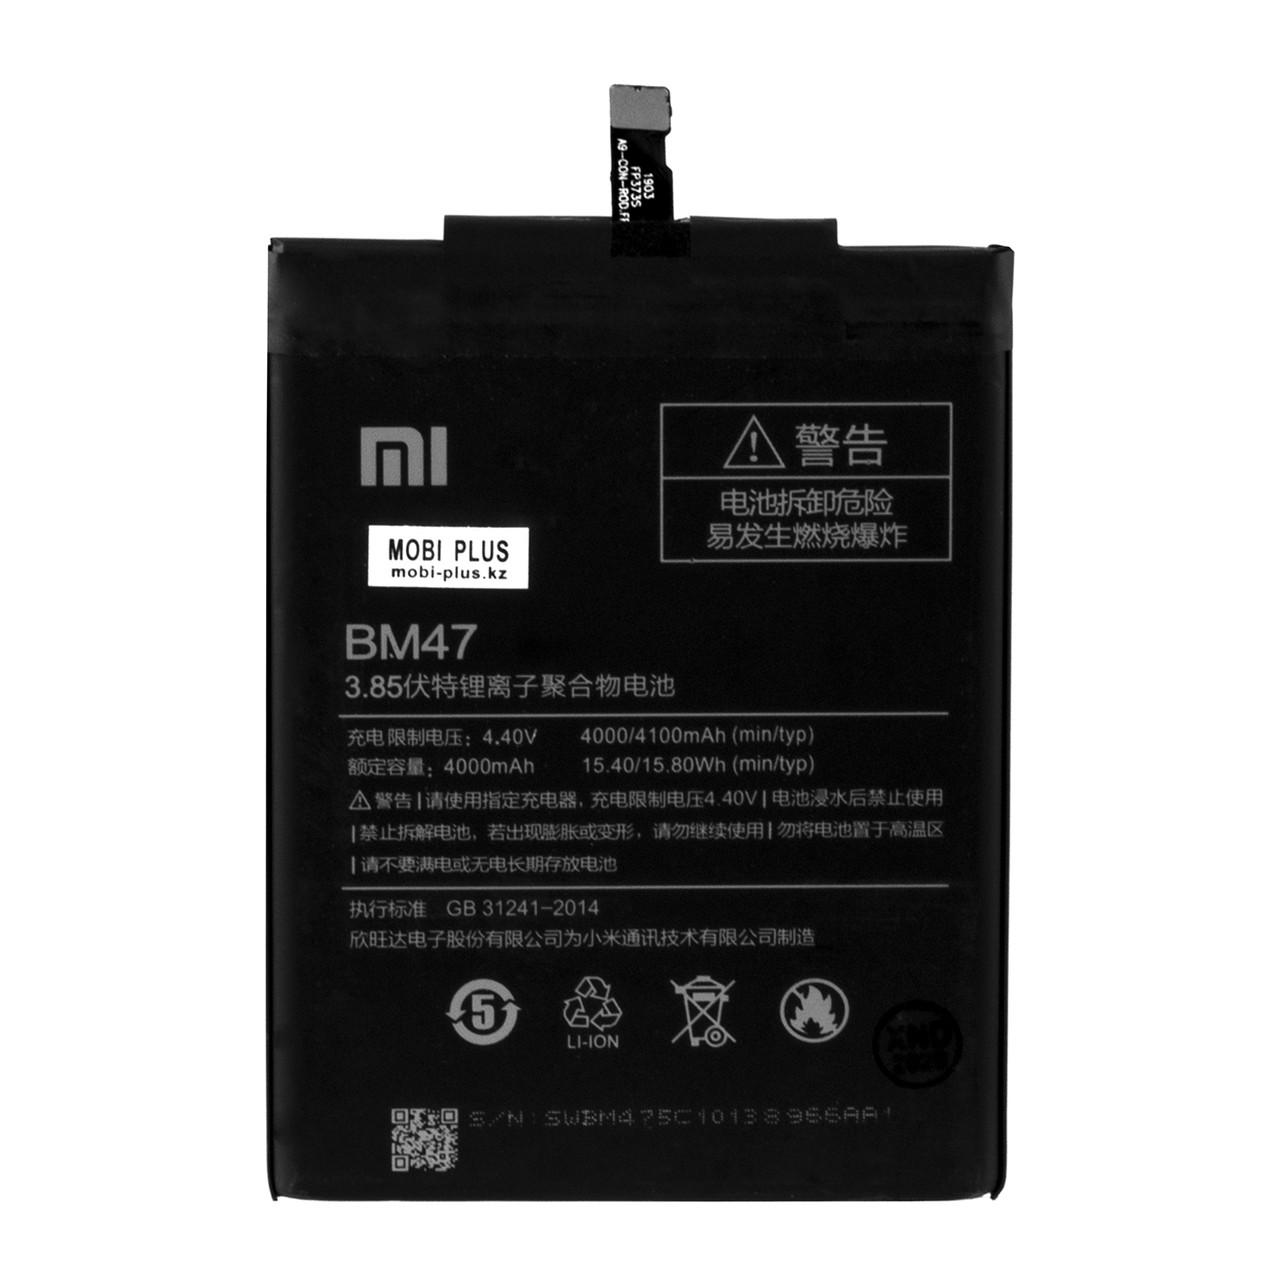 Аккумулятор Xiaomi BM47 Redmi 3/RedMi 3 Pro/Redmi 3S/4X 4000mAh GU Electronic